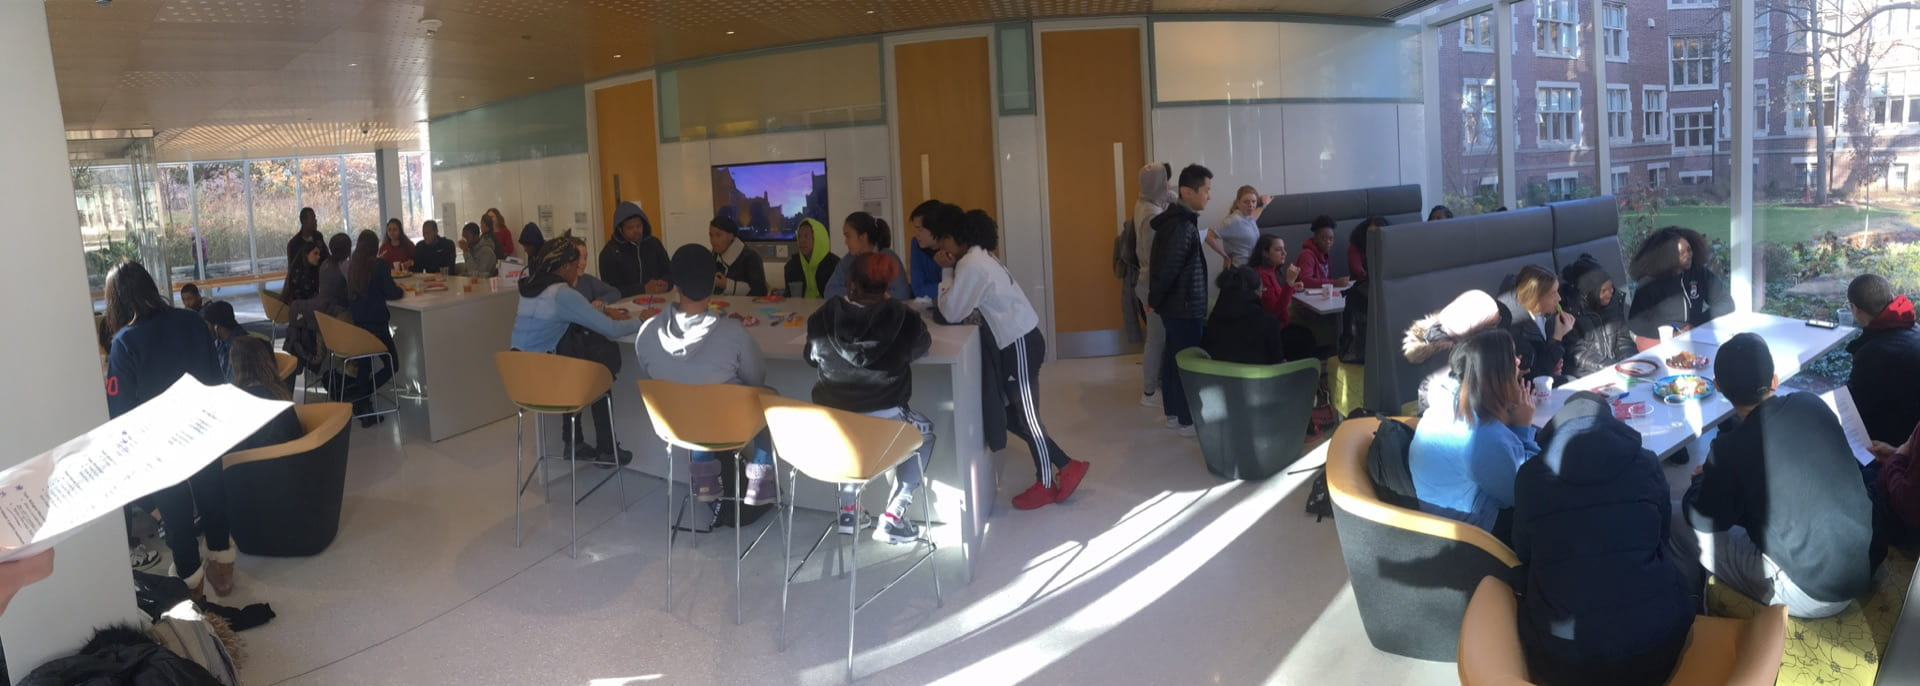 Neuroscience Community Education Lab